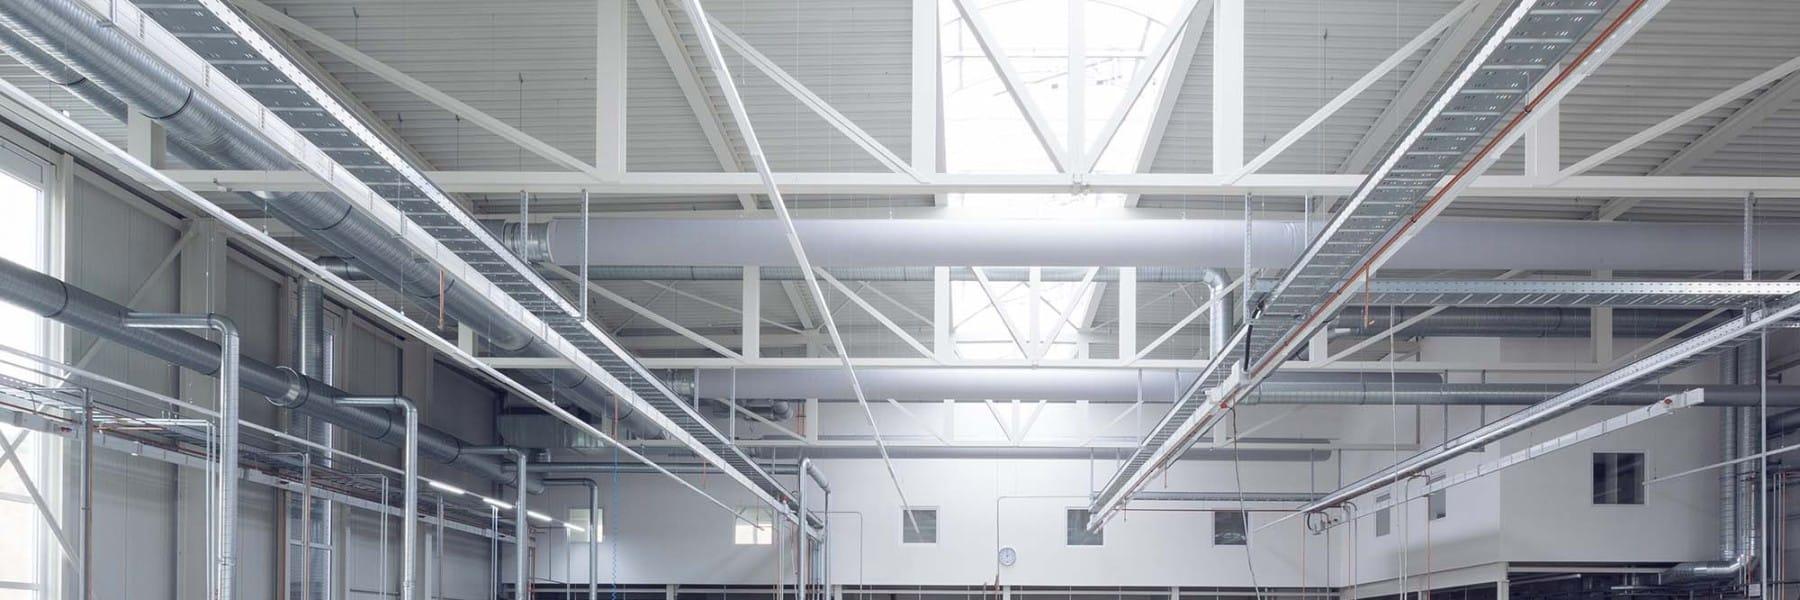 Hallenbau mit Bürogebäude